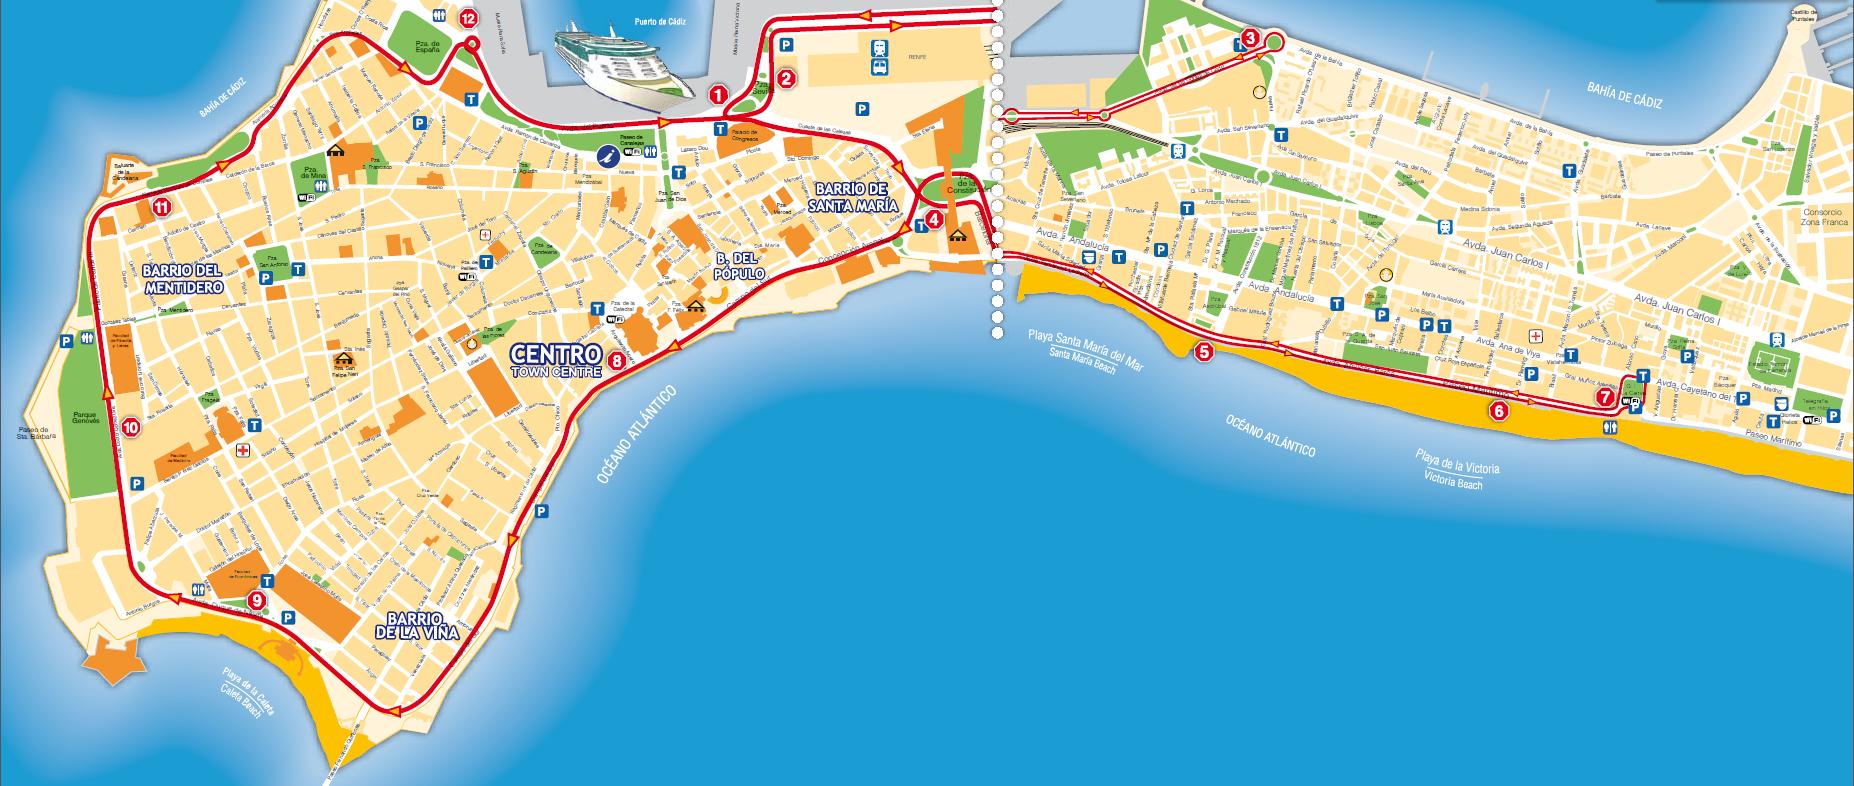 cadix-bus-localisation-carte